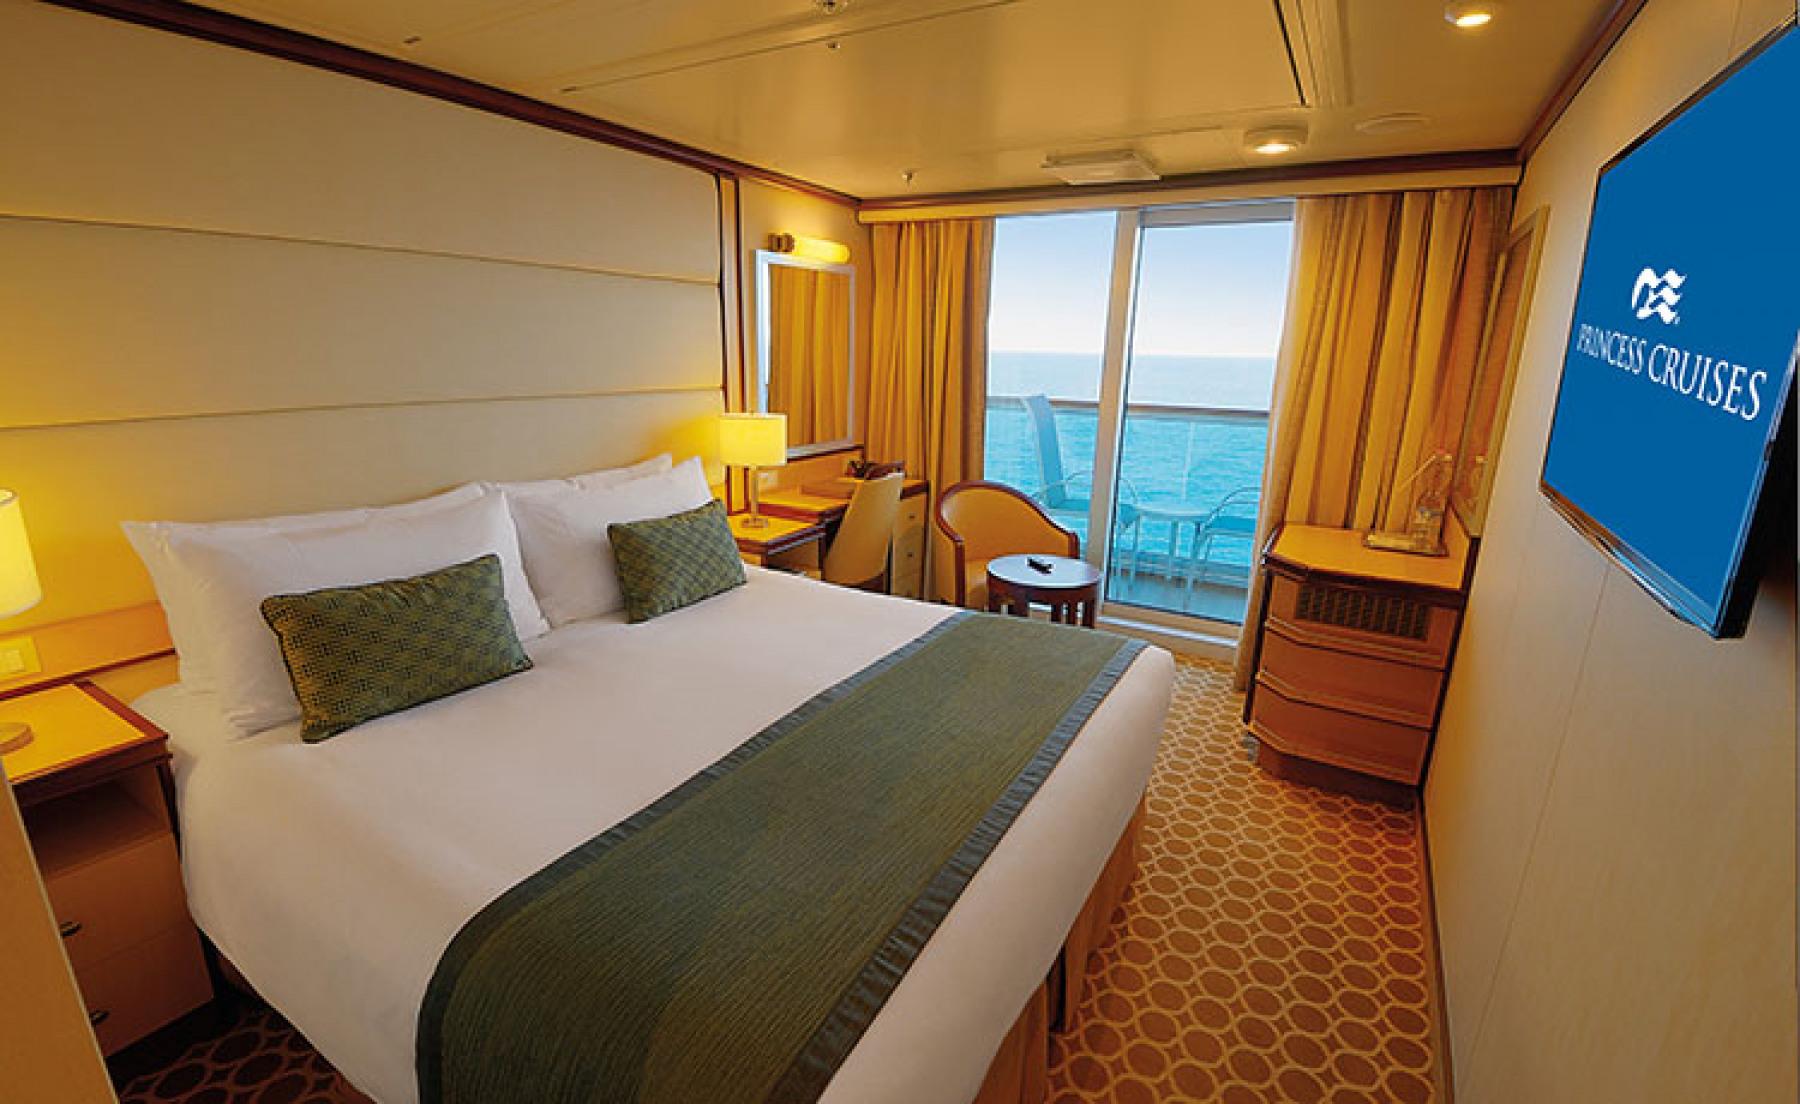 Princess Cruises Royal Class Accomodation Premium Deluxe Balcony Stateroom.jpg